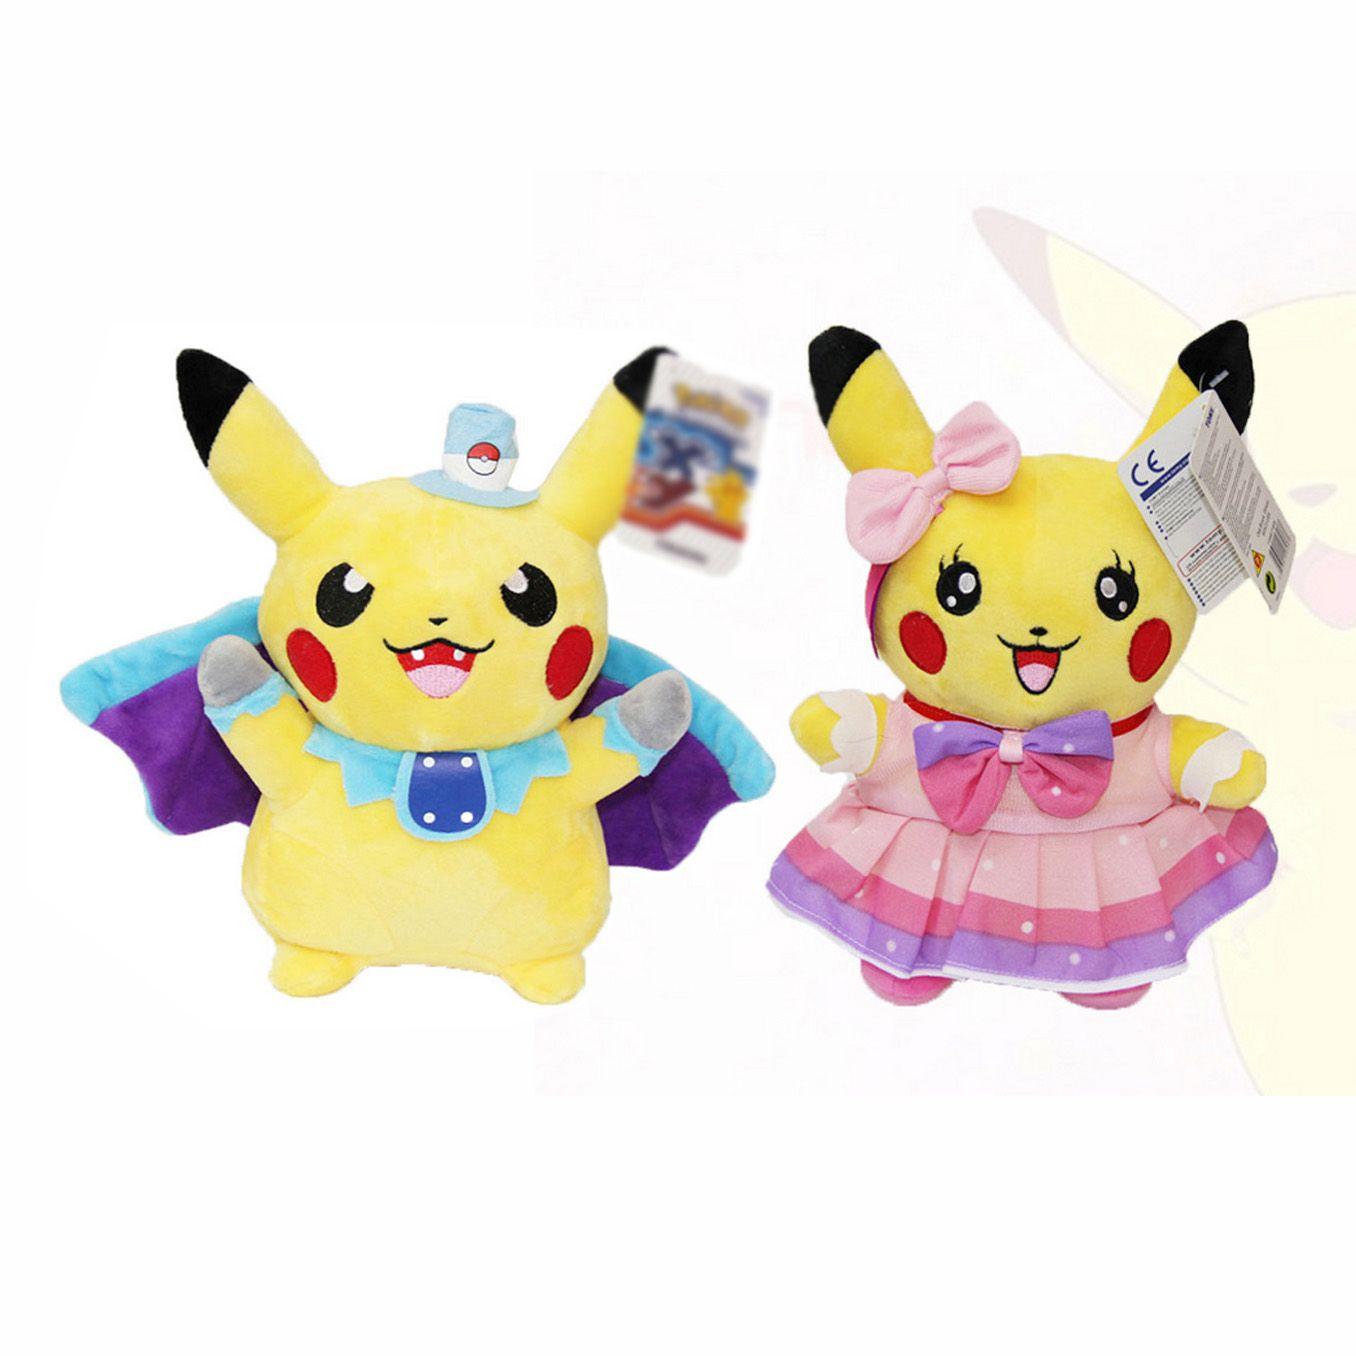 2019 Ems Pkc Cosplay Vampire Bat Pkc Pink Dress 26cm Plush Doll